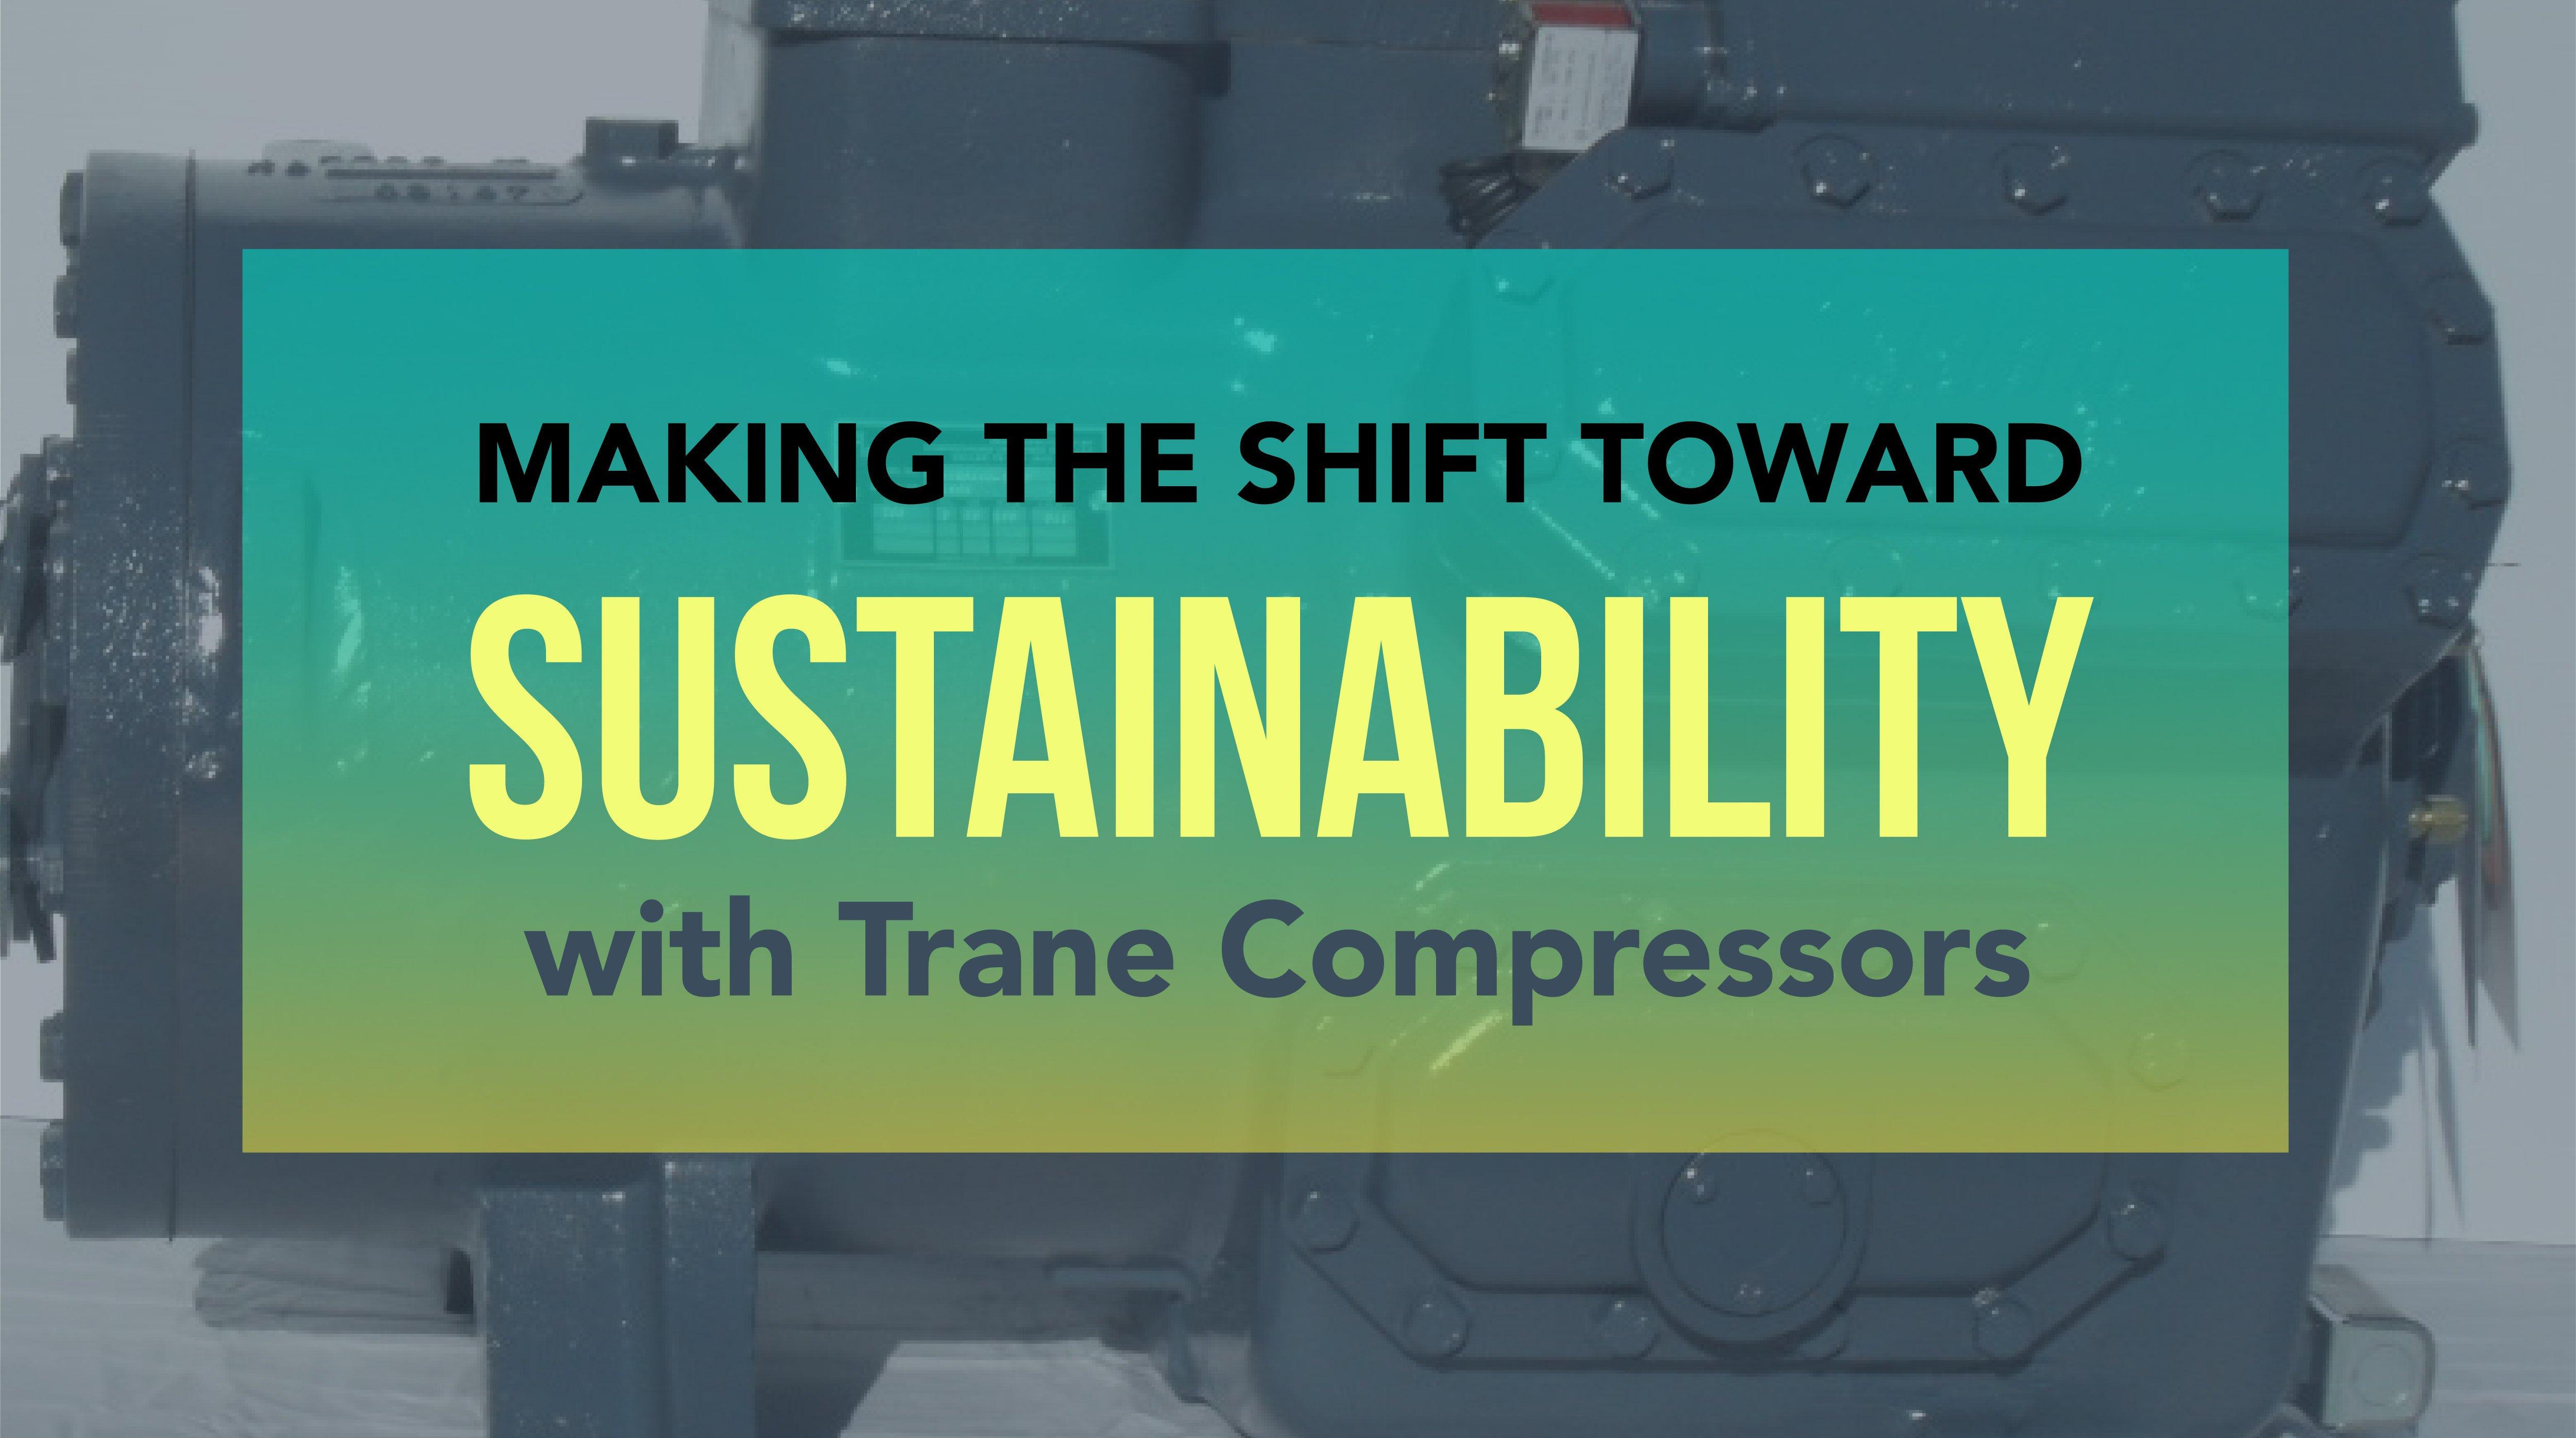 Sustainability with Trane